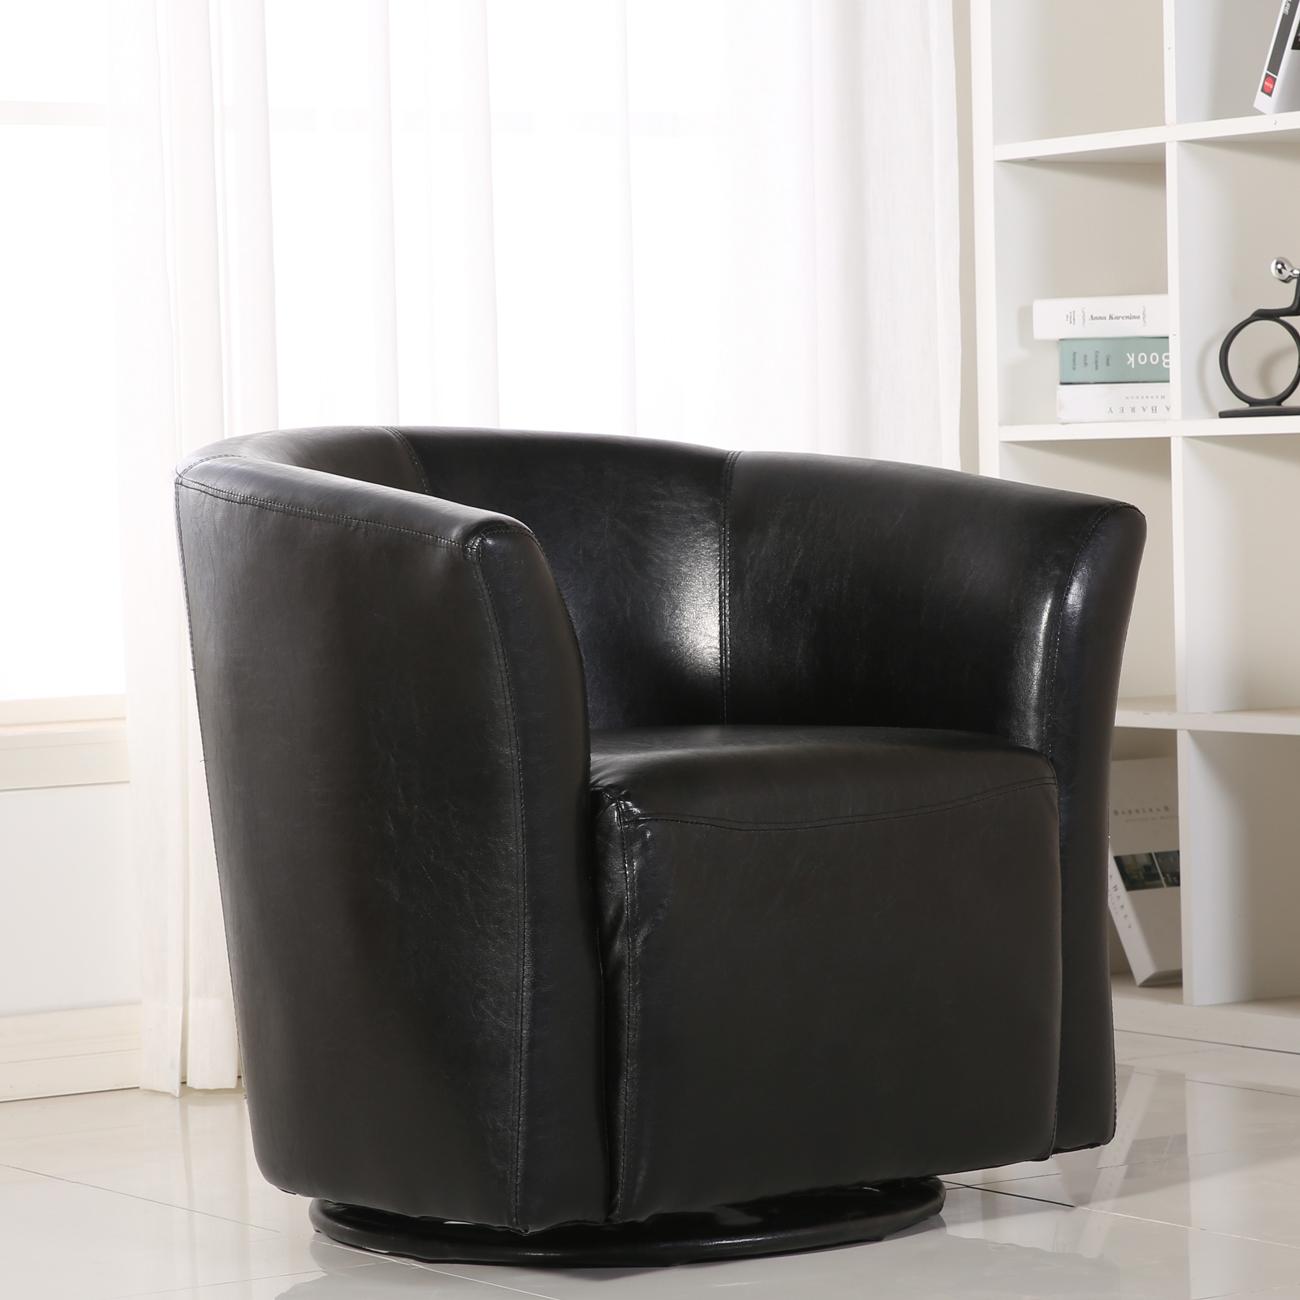 Incroyable Contemporary Swivel Base Glider Barrel ArmRest Pub Bar Round Chair, Black